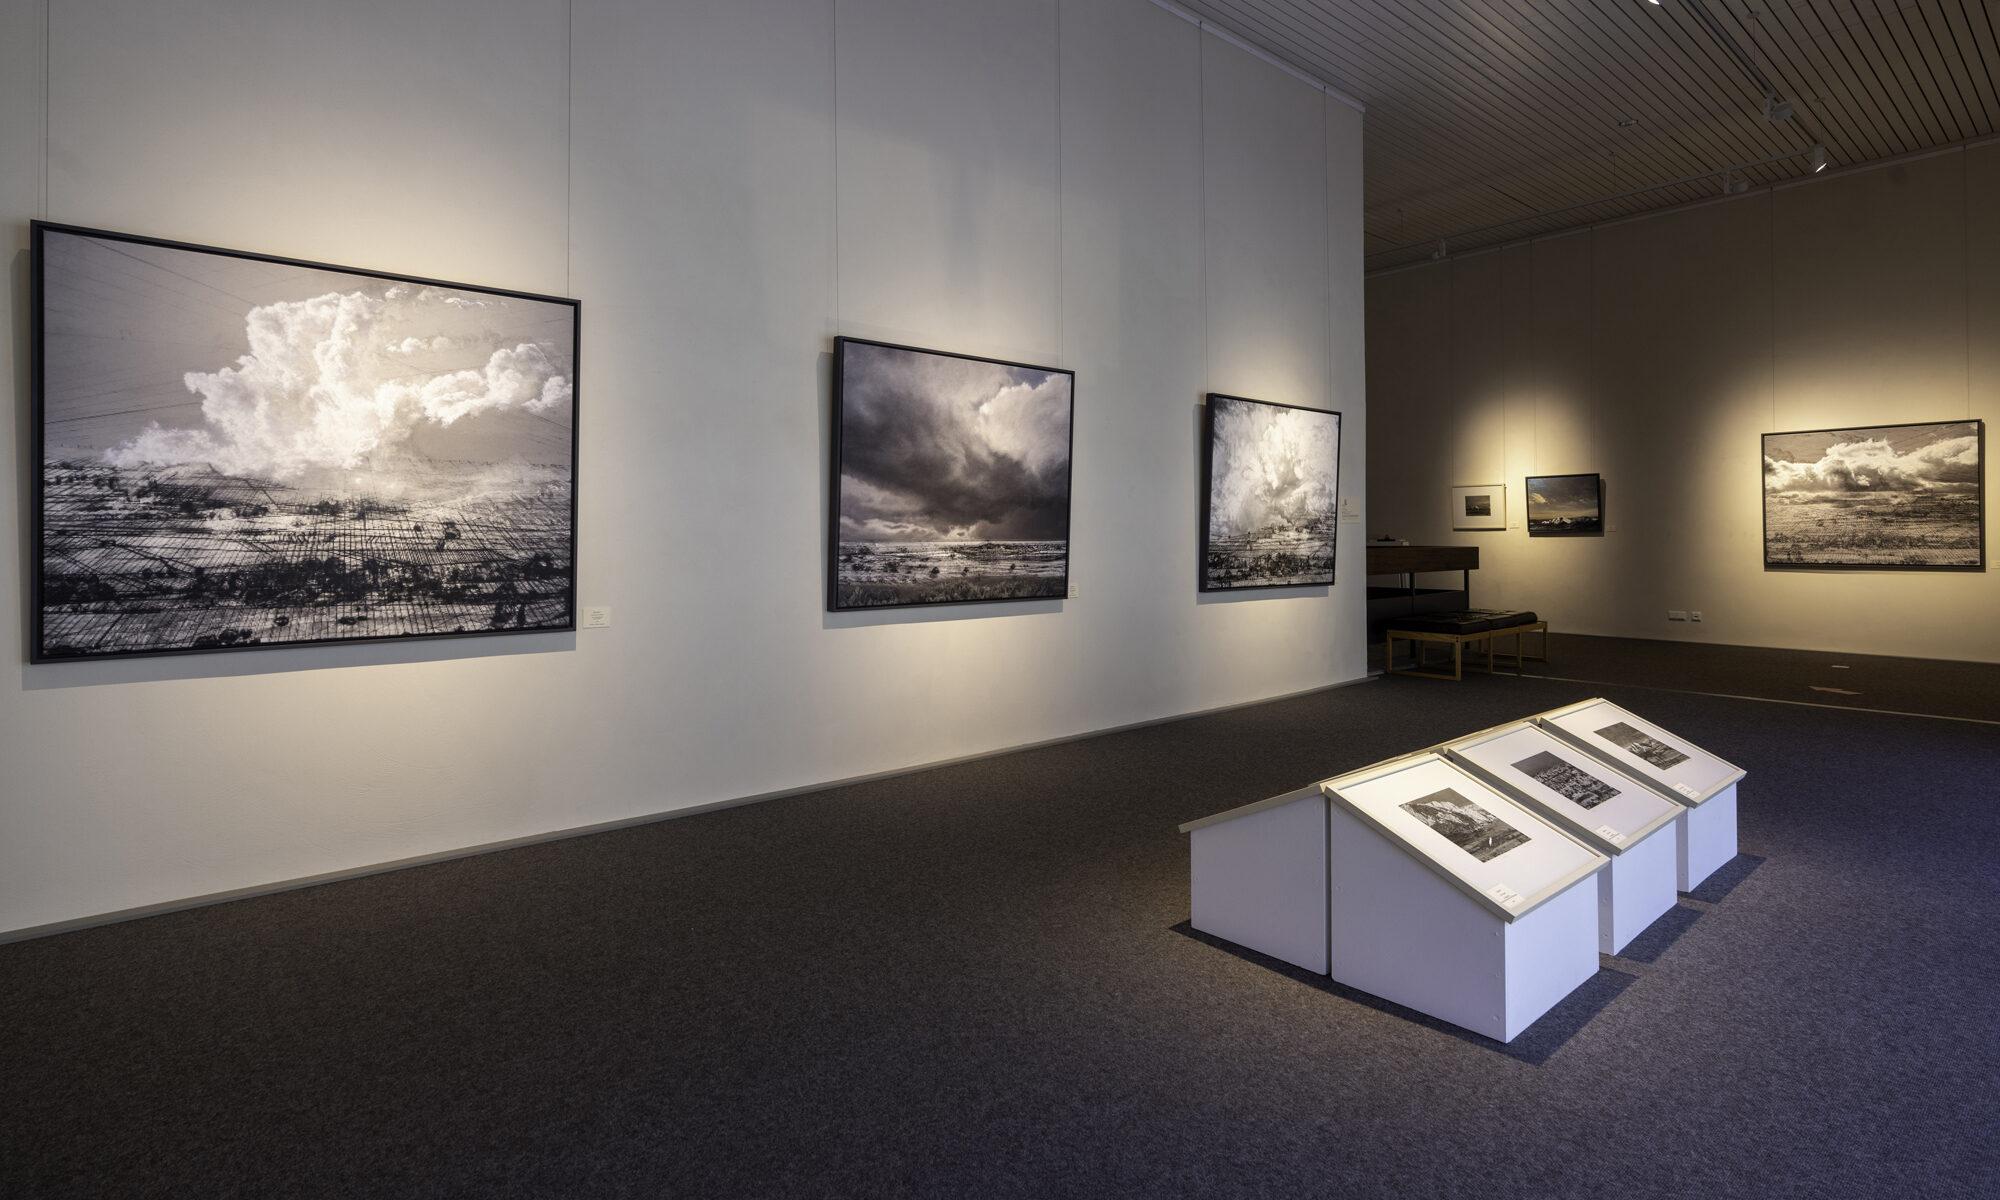 Terra Cognita / Drawing - Printmaking - Painting, Museum Wilhelm Morgner, Soest, exhibition view, 2020 ©photo: Gero Sliva